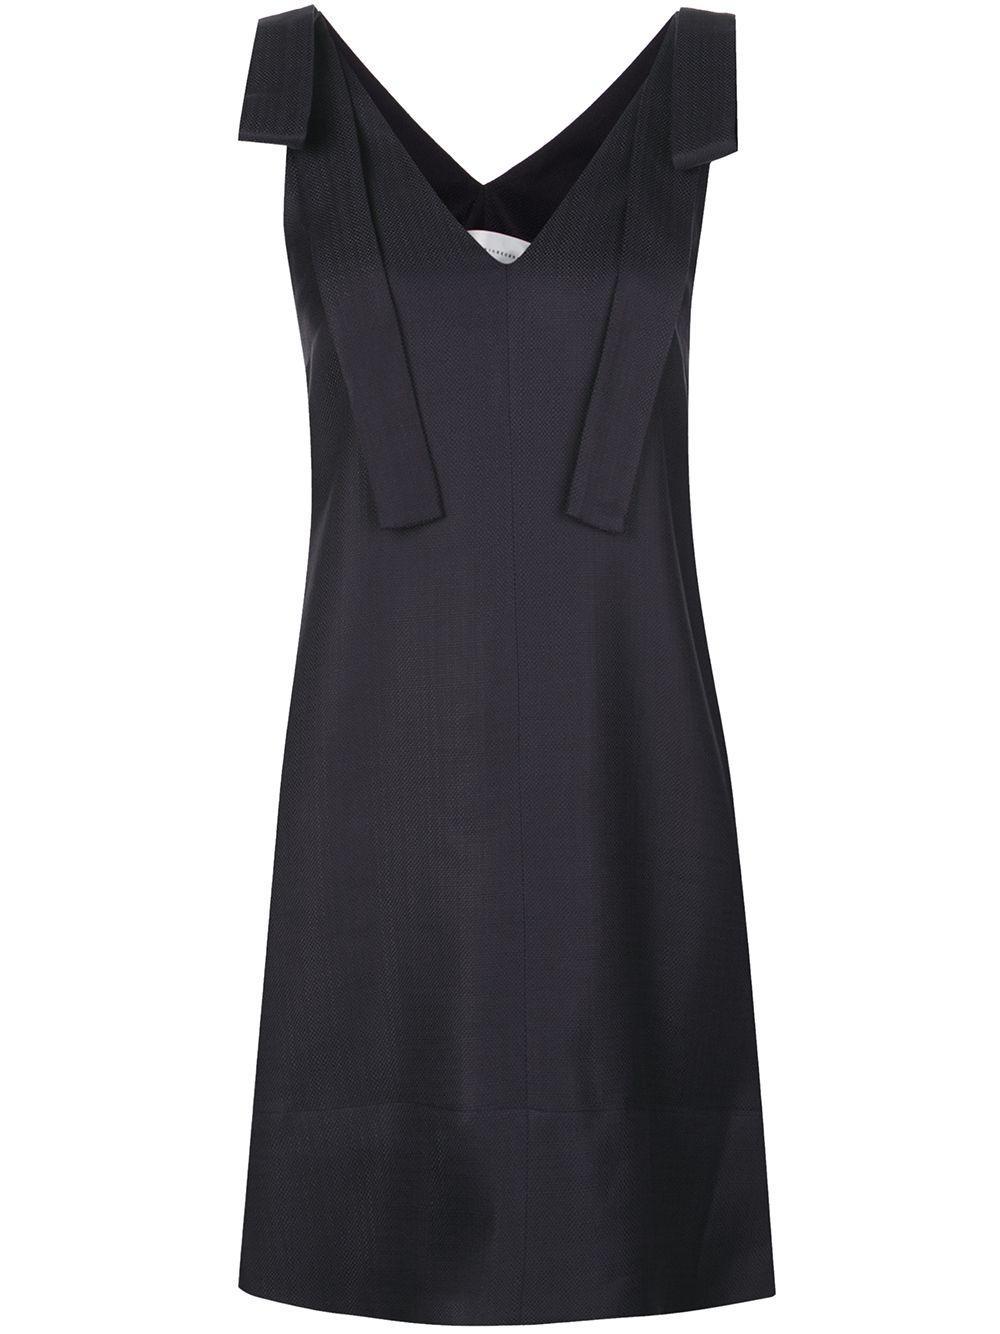 Sleeveless Tie Shoulder Dress Item # 2120WDR000535B